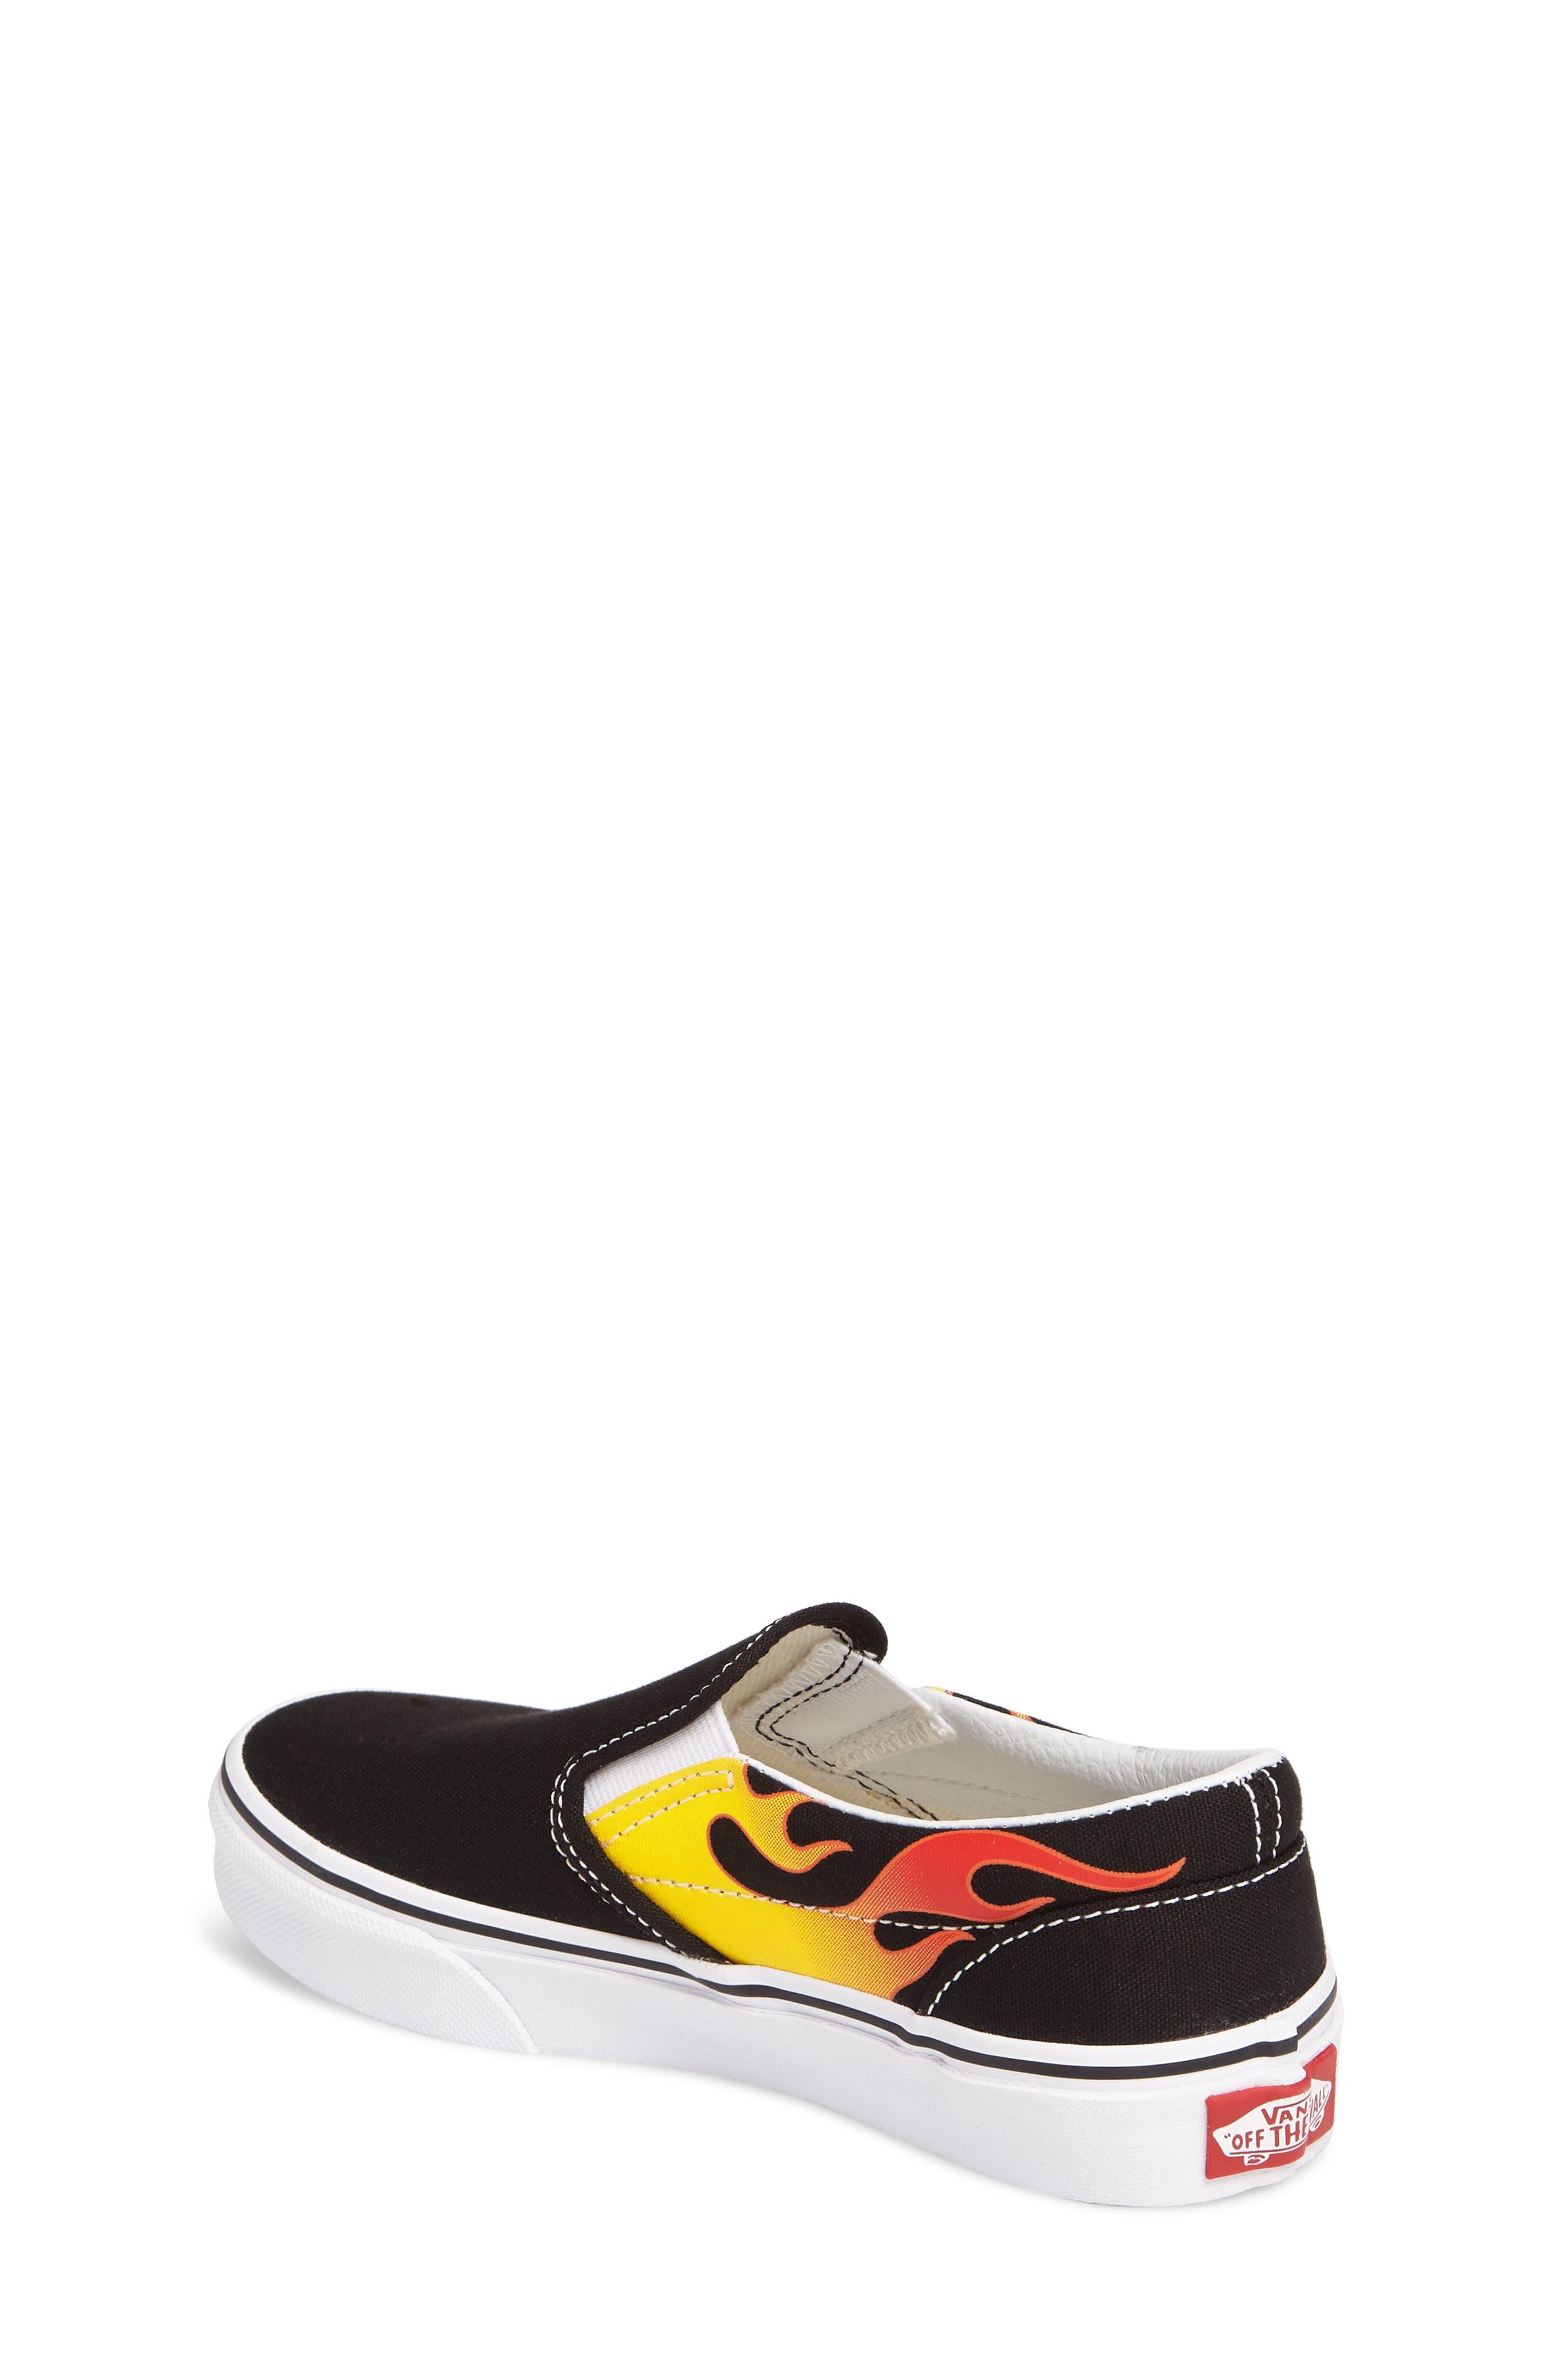 Alternate Image 2  - Vans Flame Classic Slip-On Sneaker (Toddler, Little Kid & Big Kid)